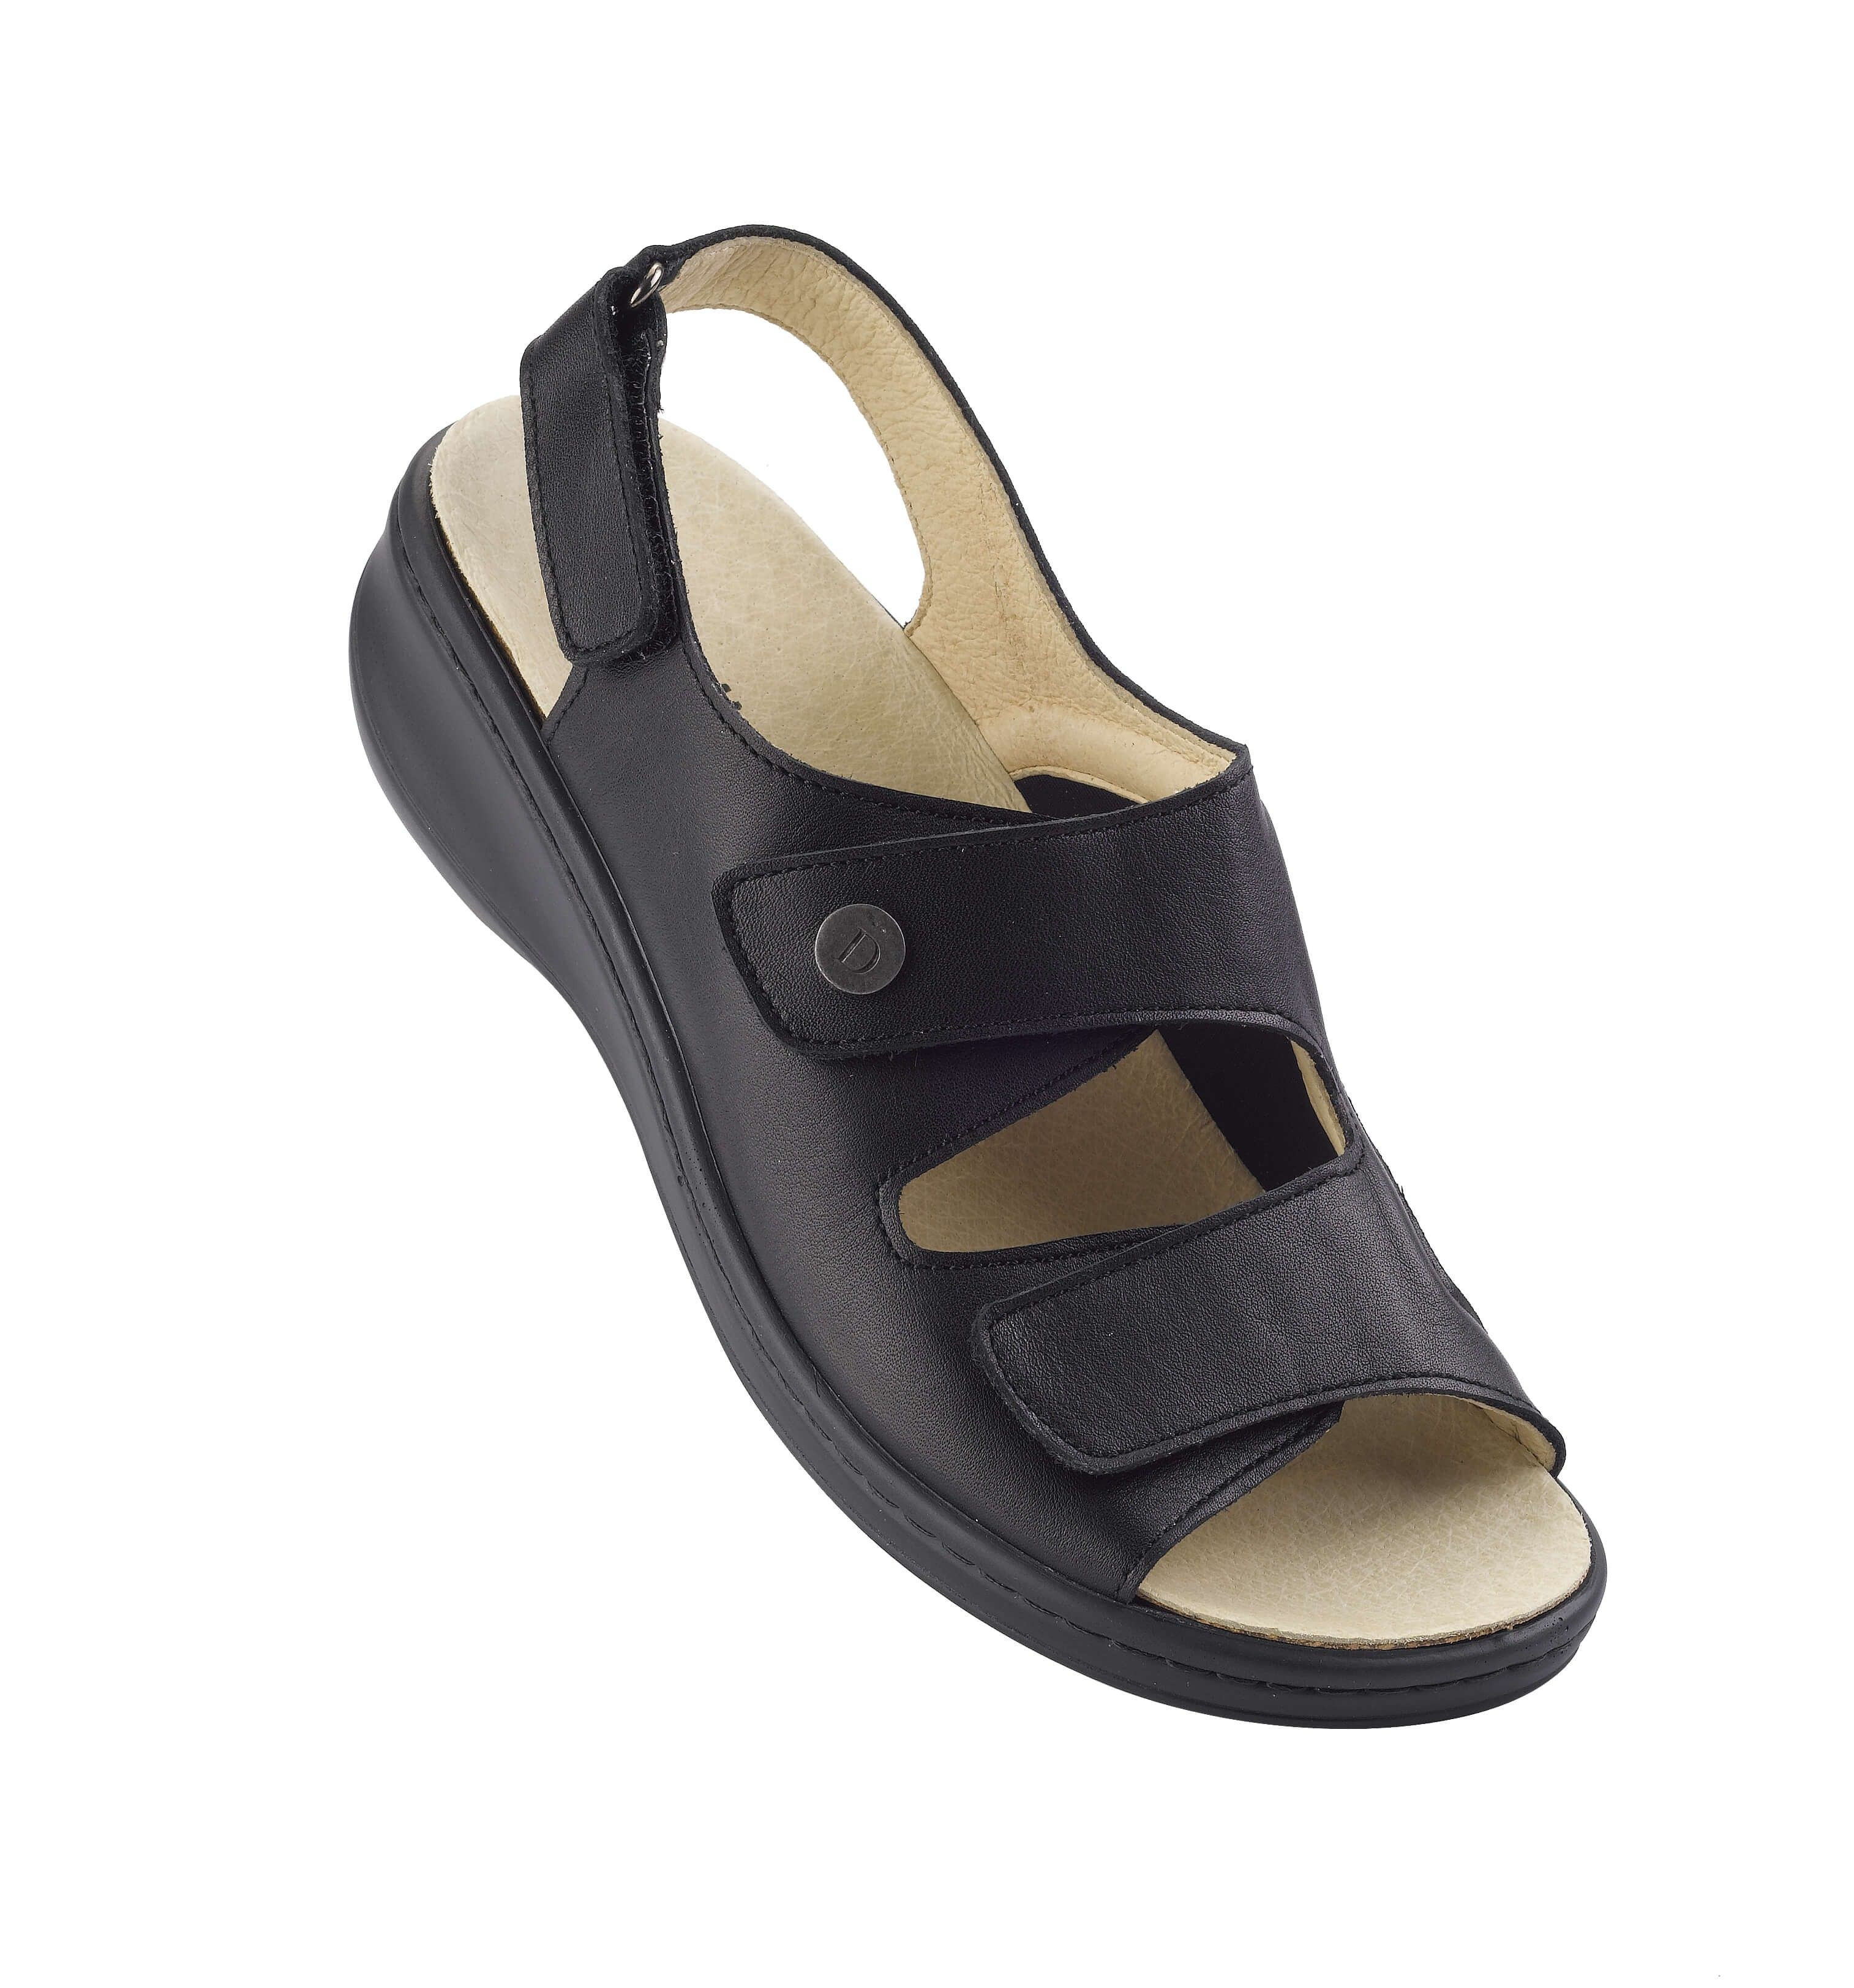 db03ef2ebc Sandalia ortopédica con velcro especial juanetes de Daimar